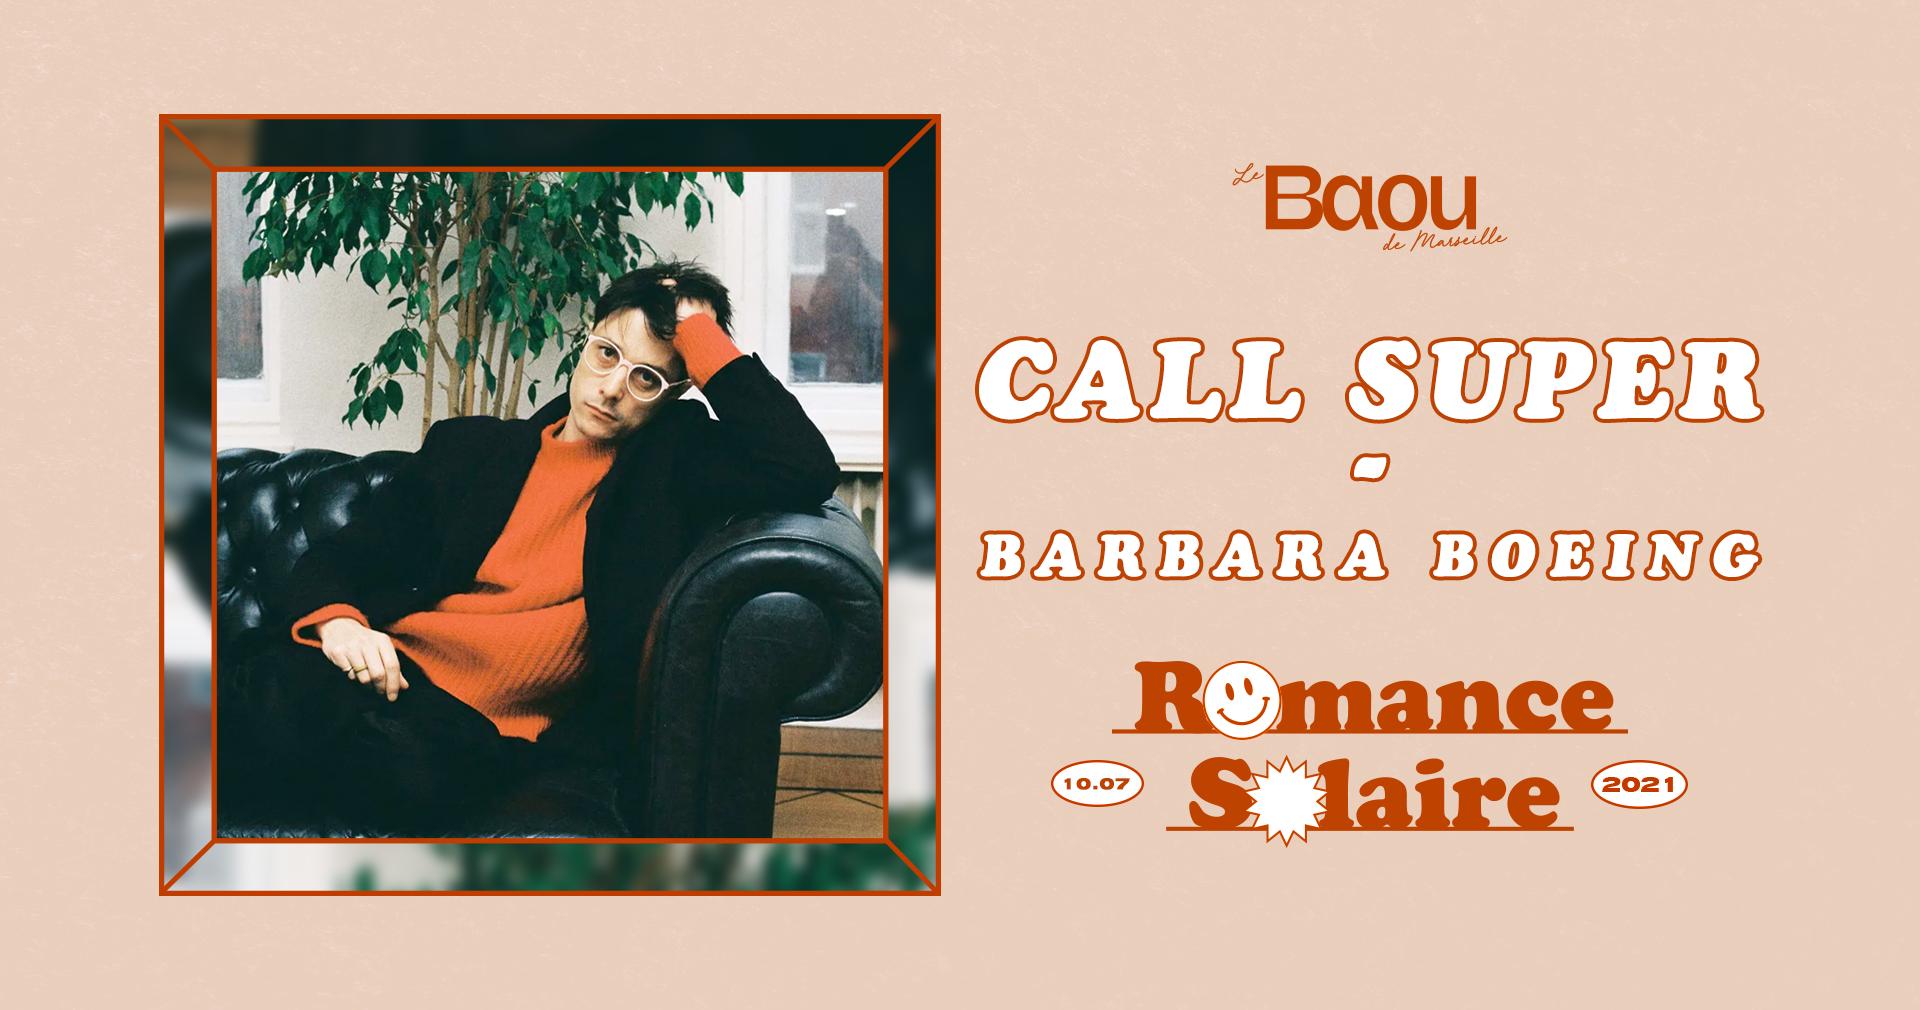 BAOU : Romance Solaire / Call Super + Barbara Boeing